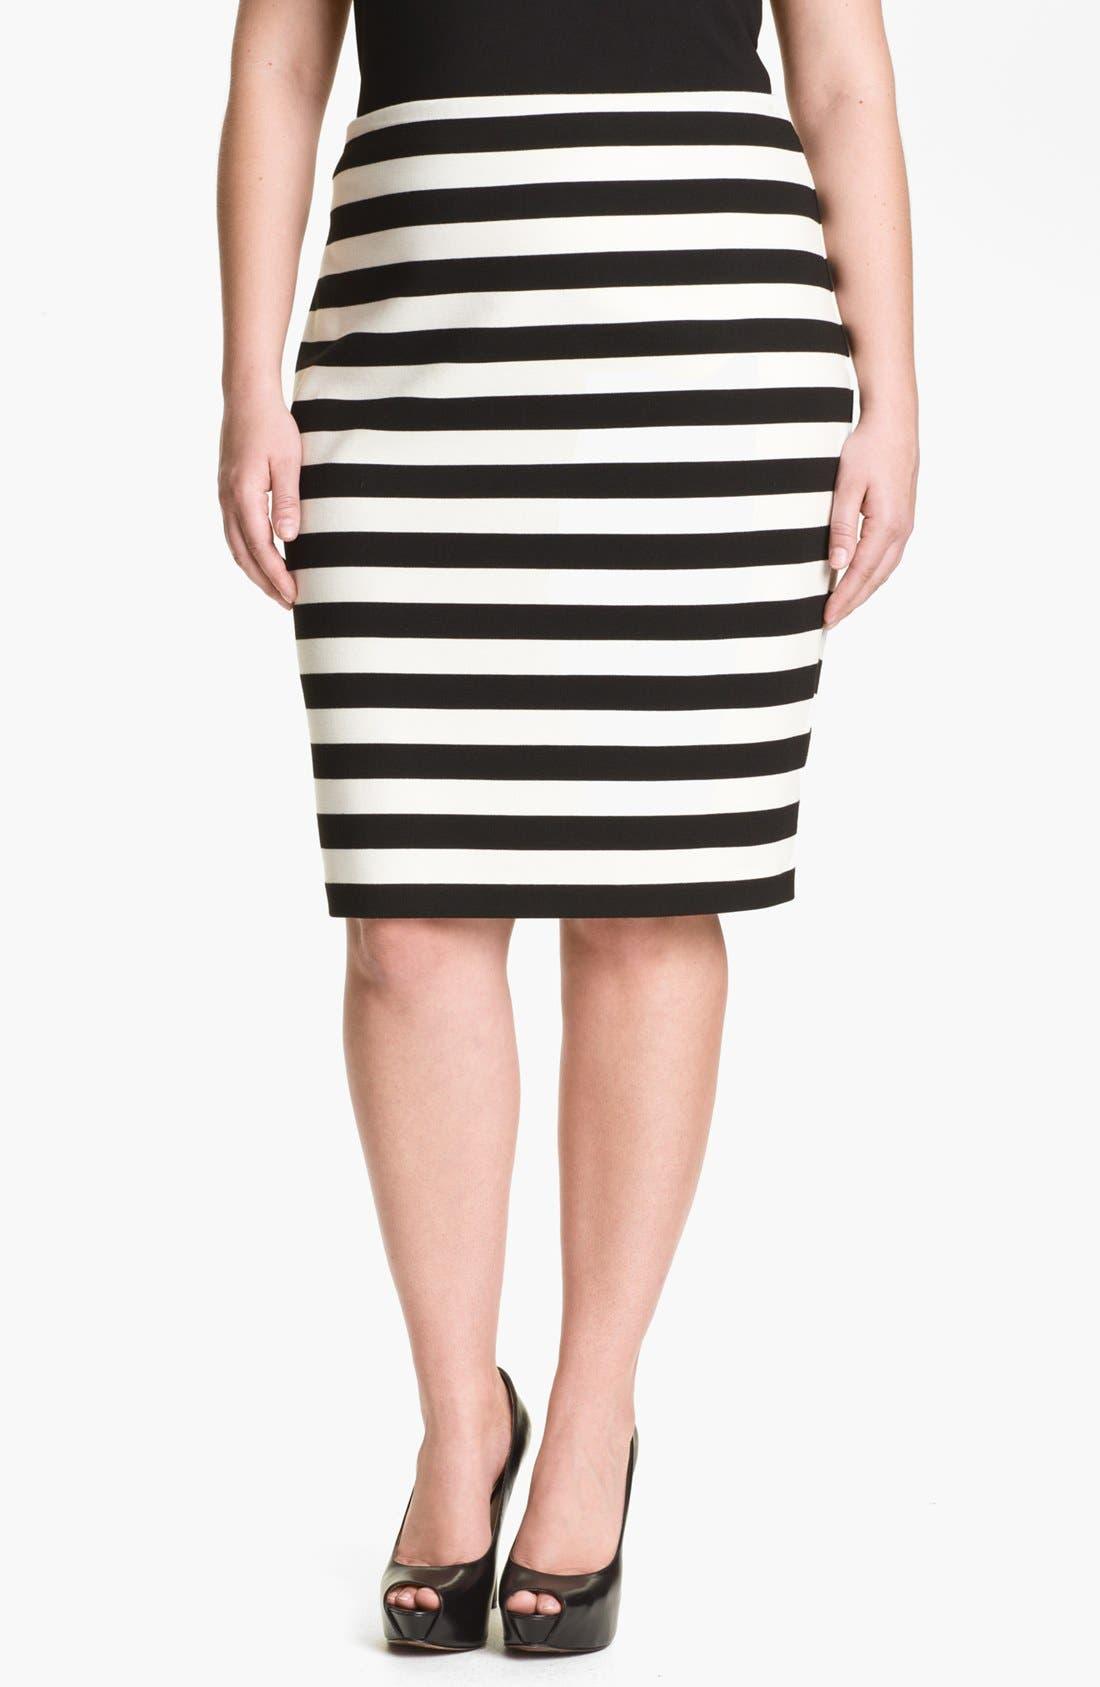 Alternate Image 1 Selected - Vince Camuto Stripe Pencil Skirt (Plus Size)